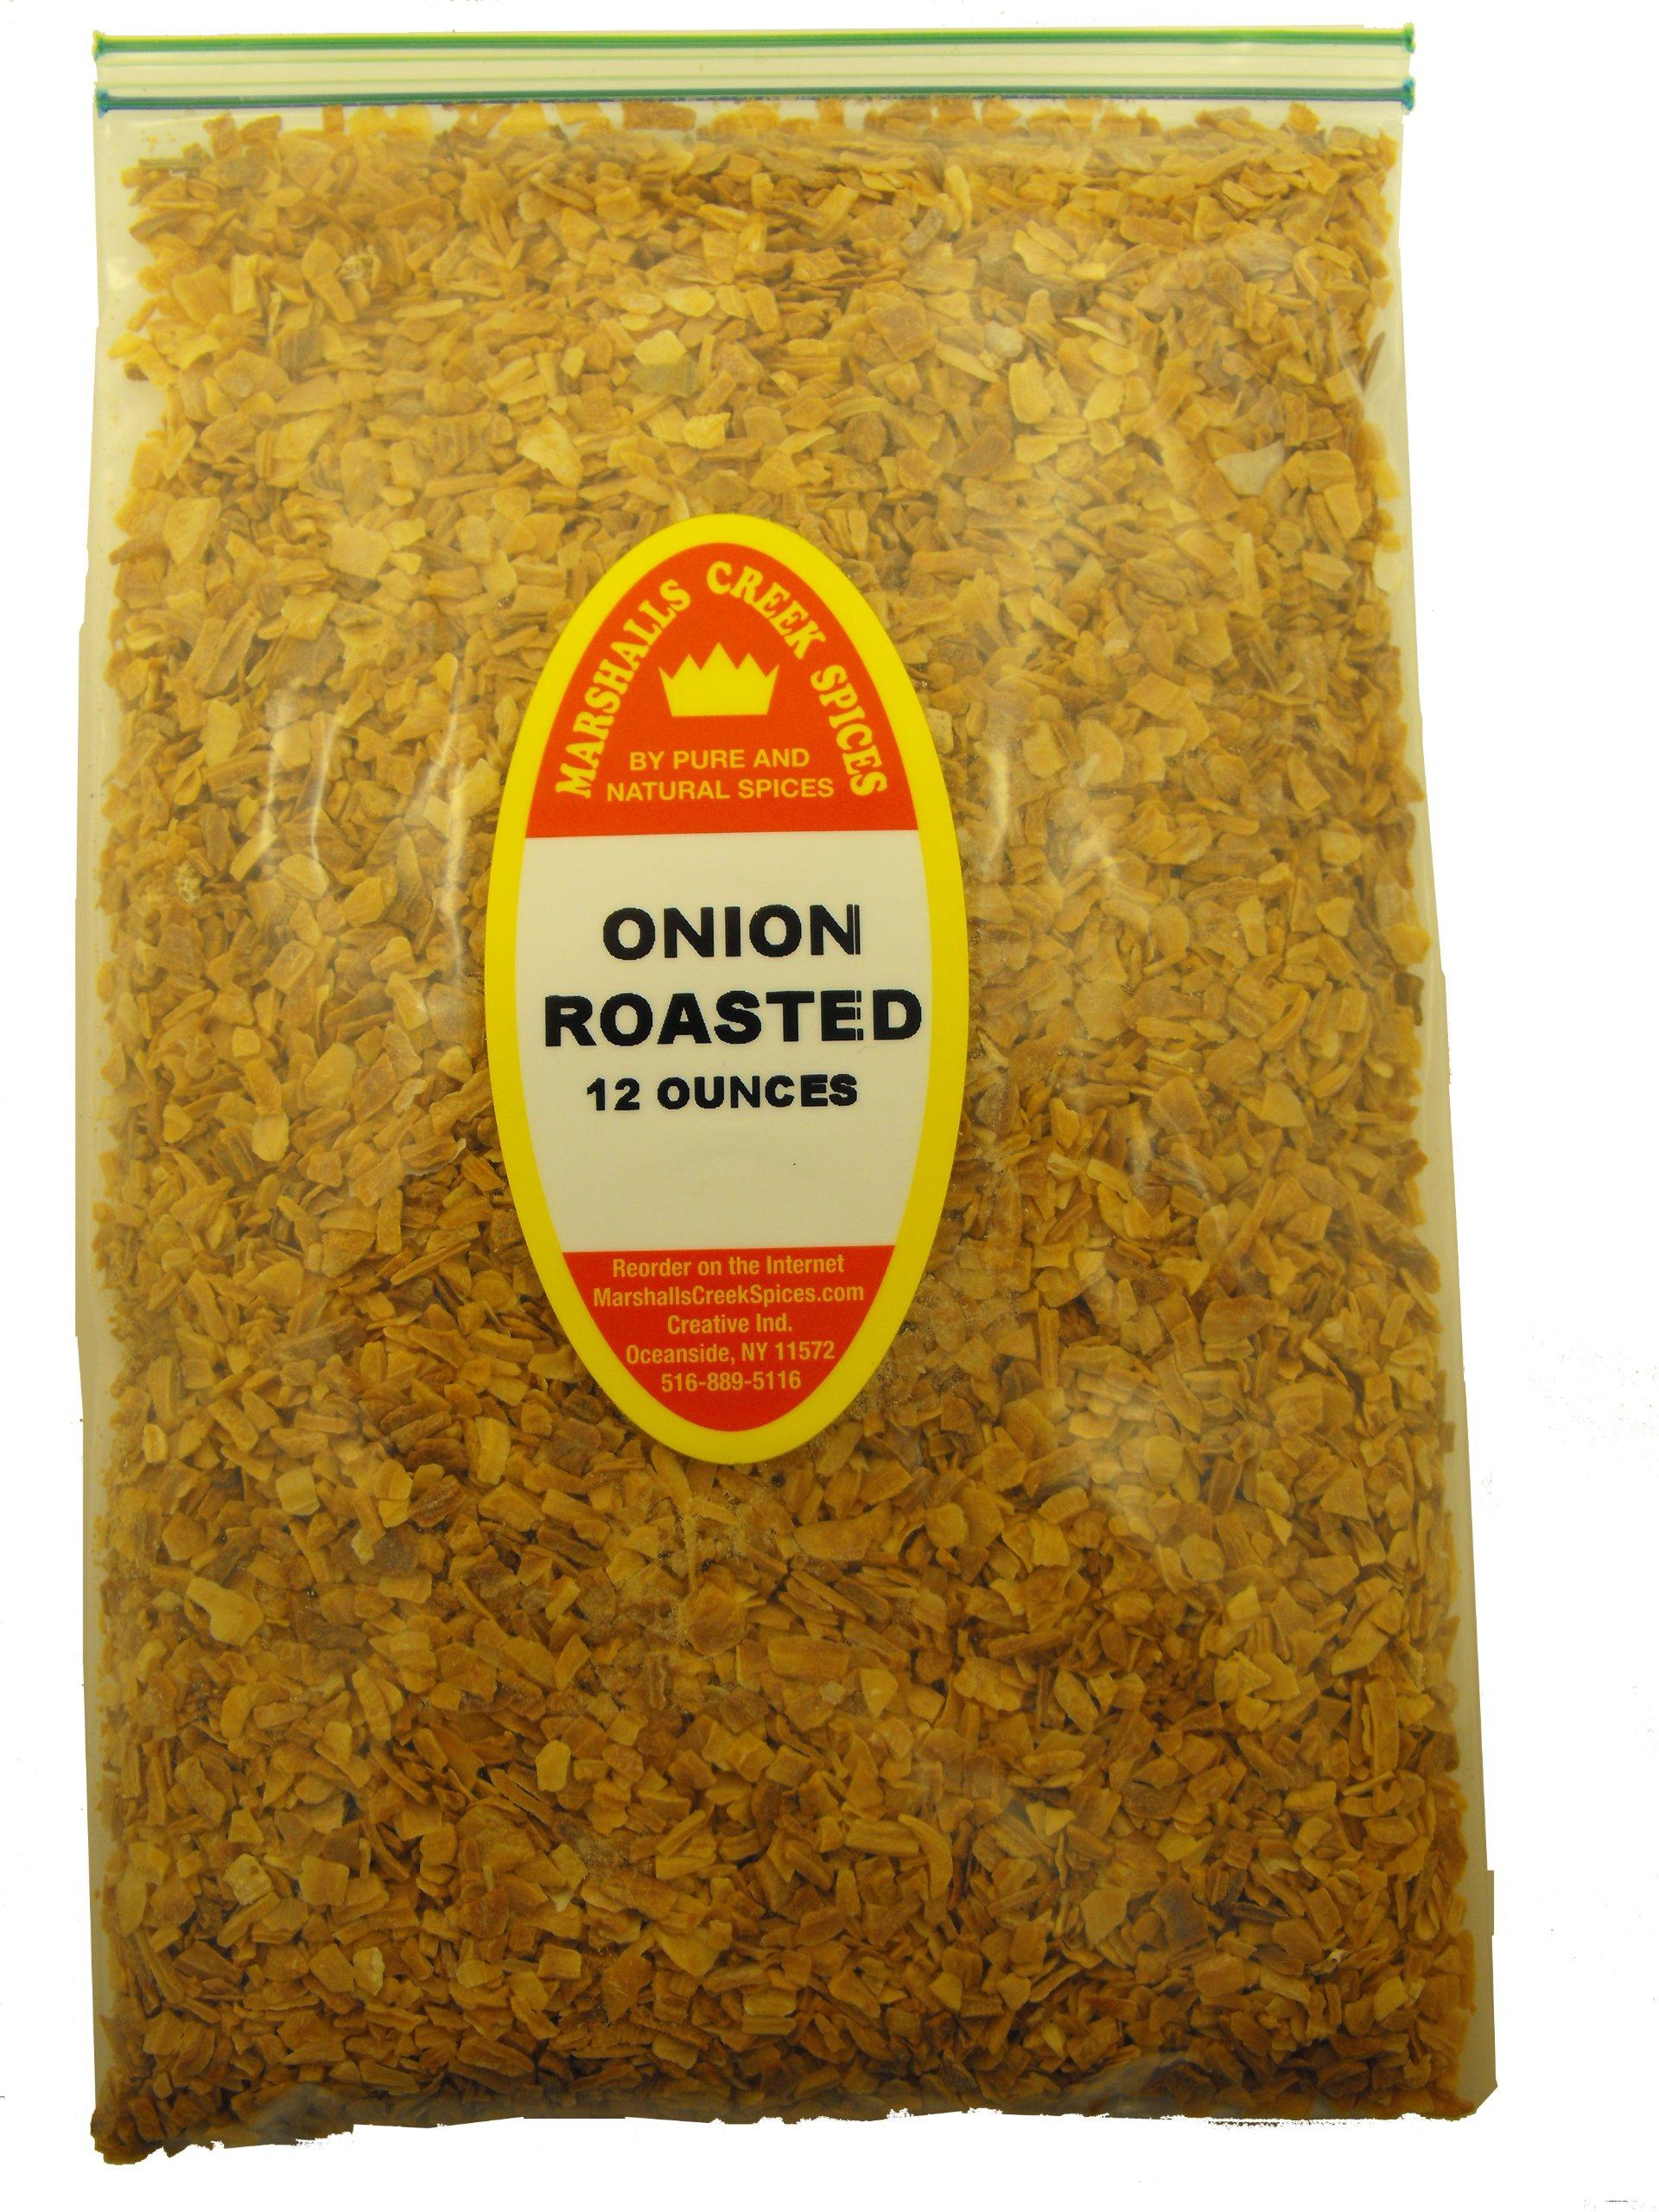 XL REFILL Marshalls Creek Spices Roasted Onion Chopped Seasoning, 12 Ounce